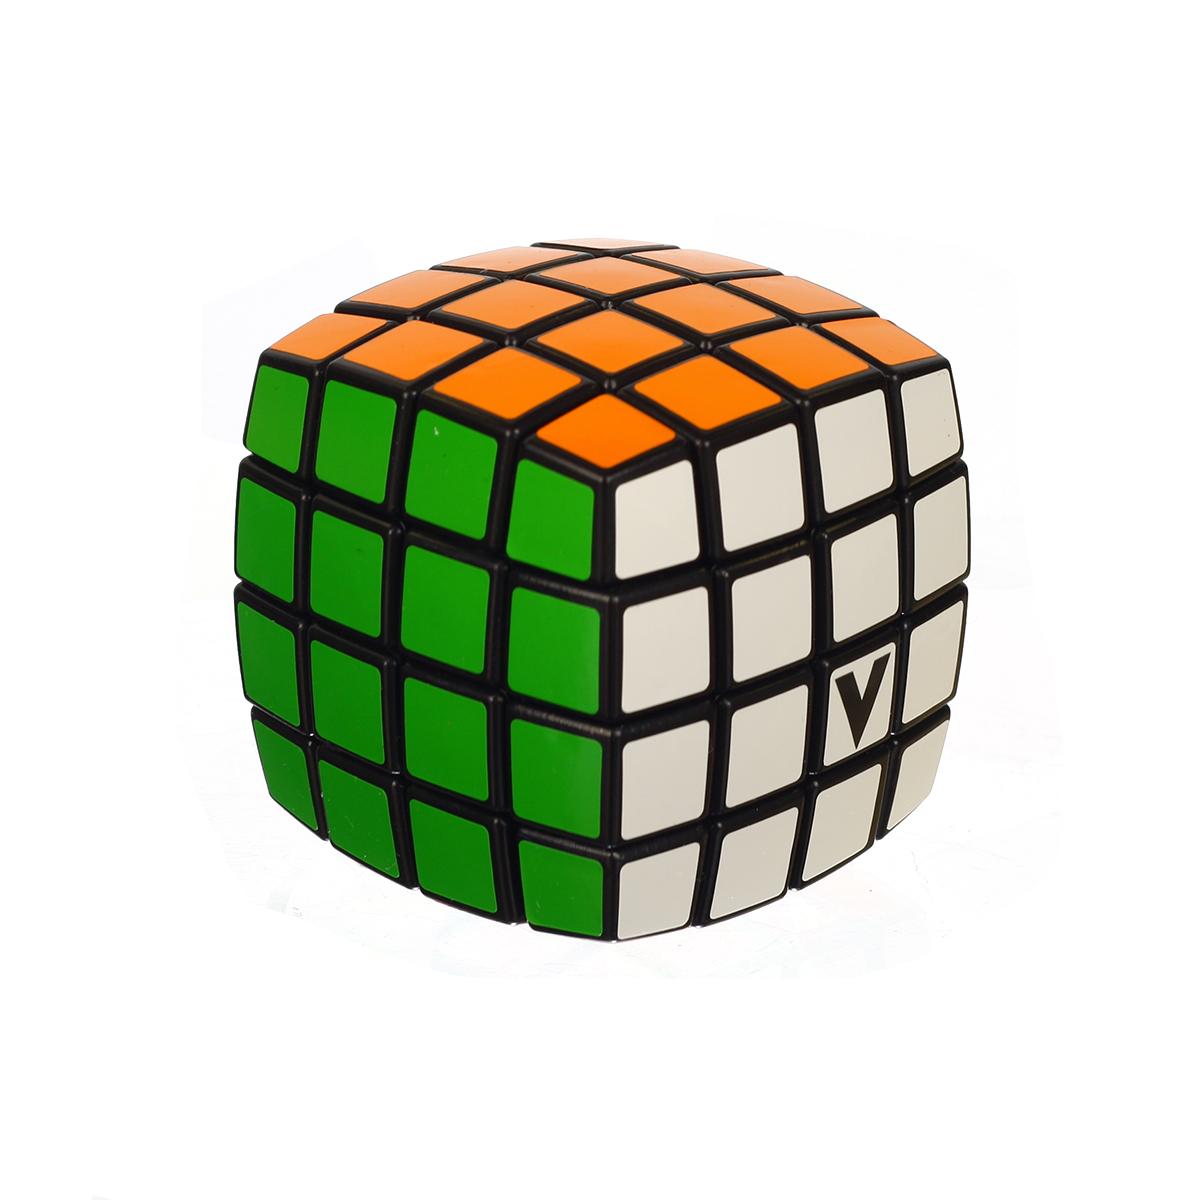 V Cube v cube 4b black v cube wholesale distributor orbet international